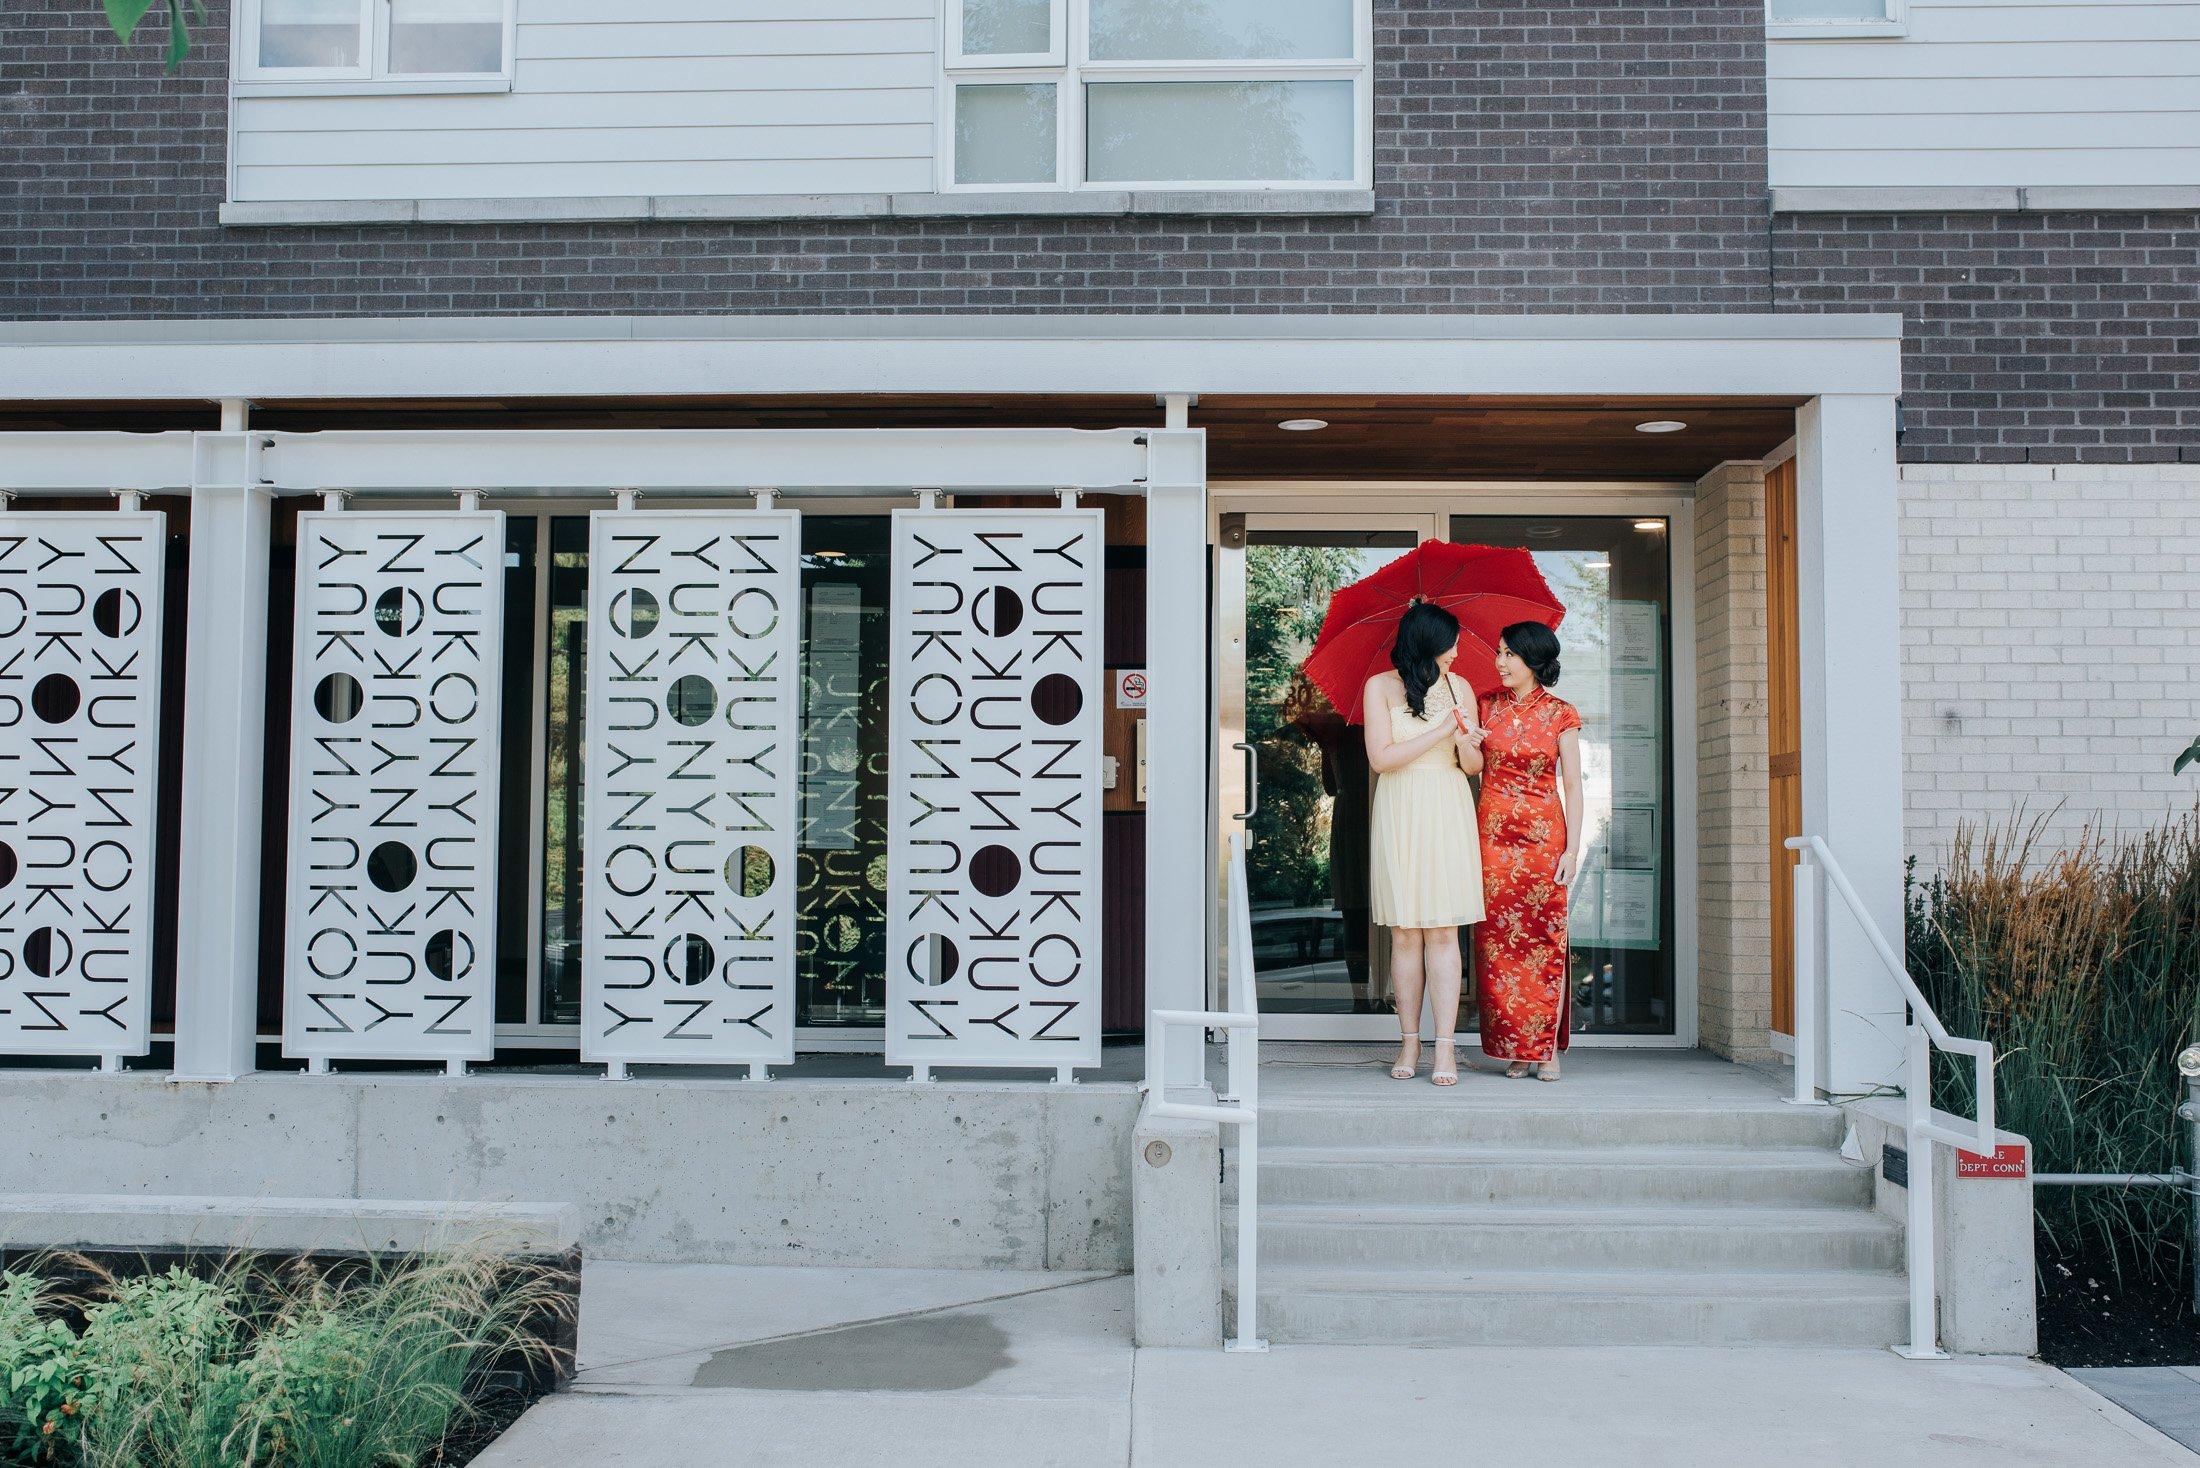 012 - red umbrella Chinese wedding